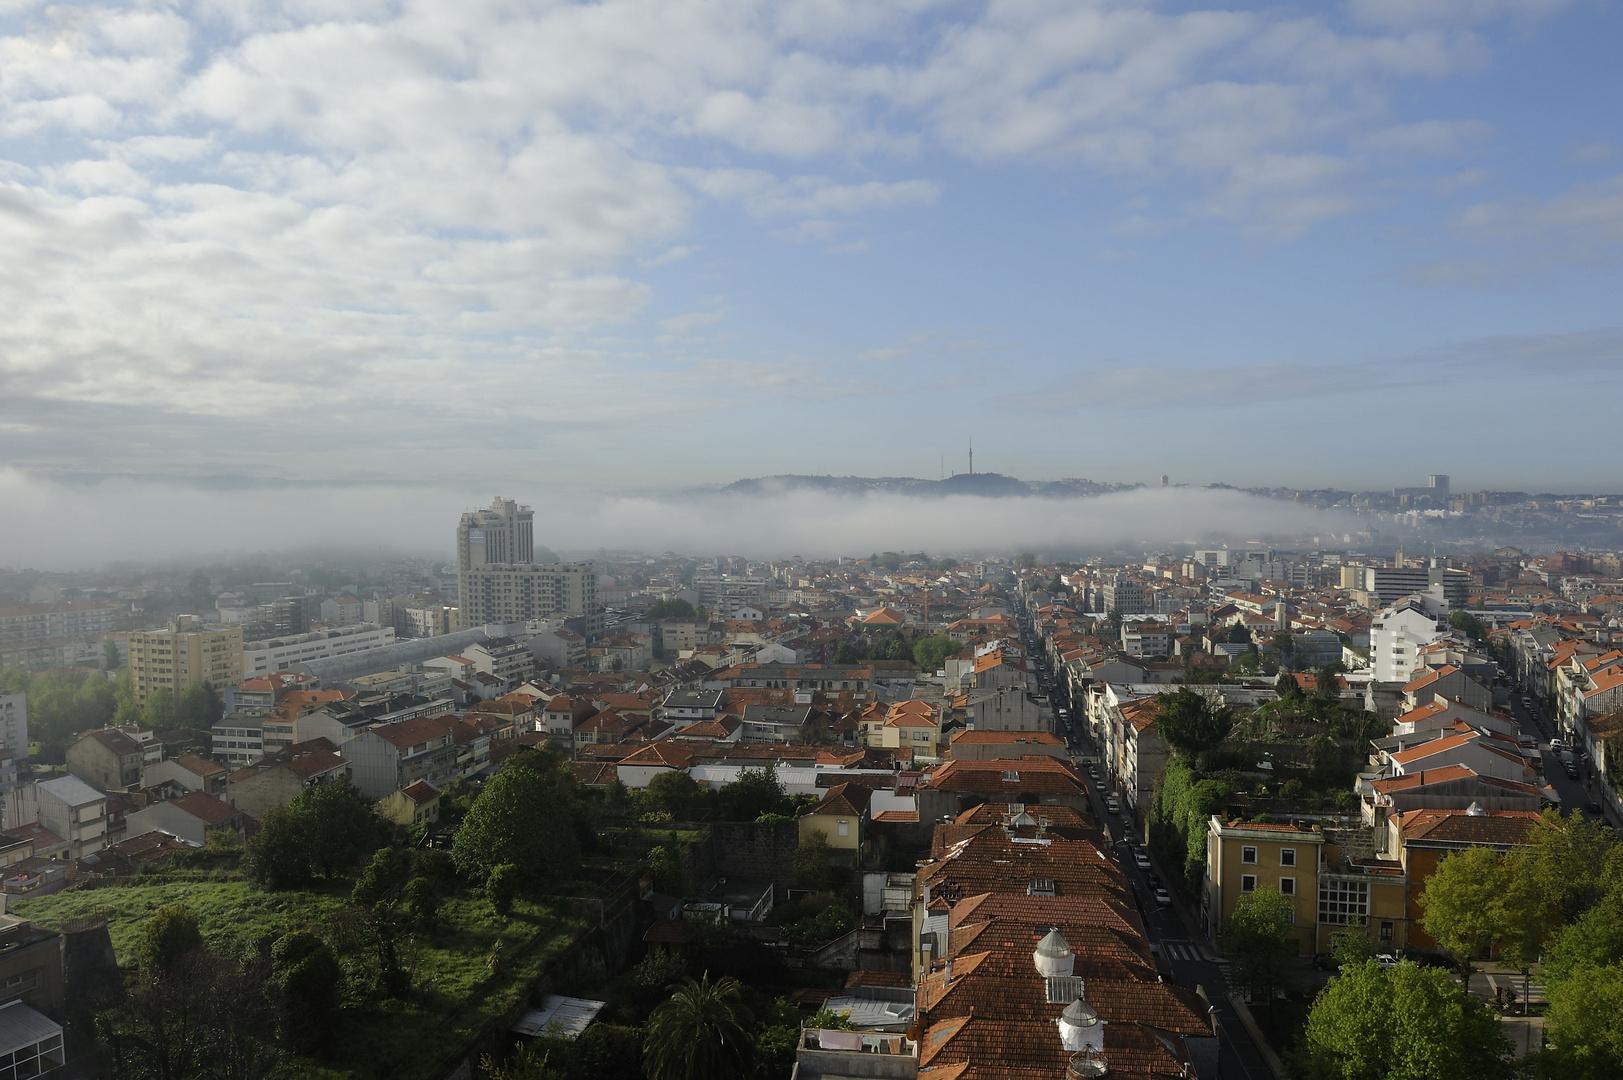 Wake up big old city